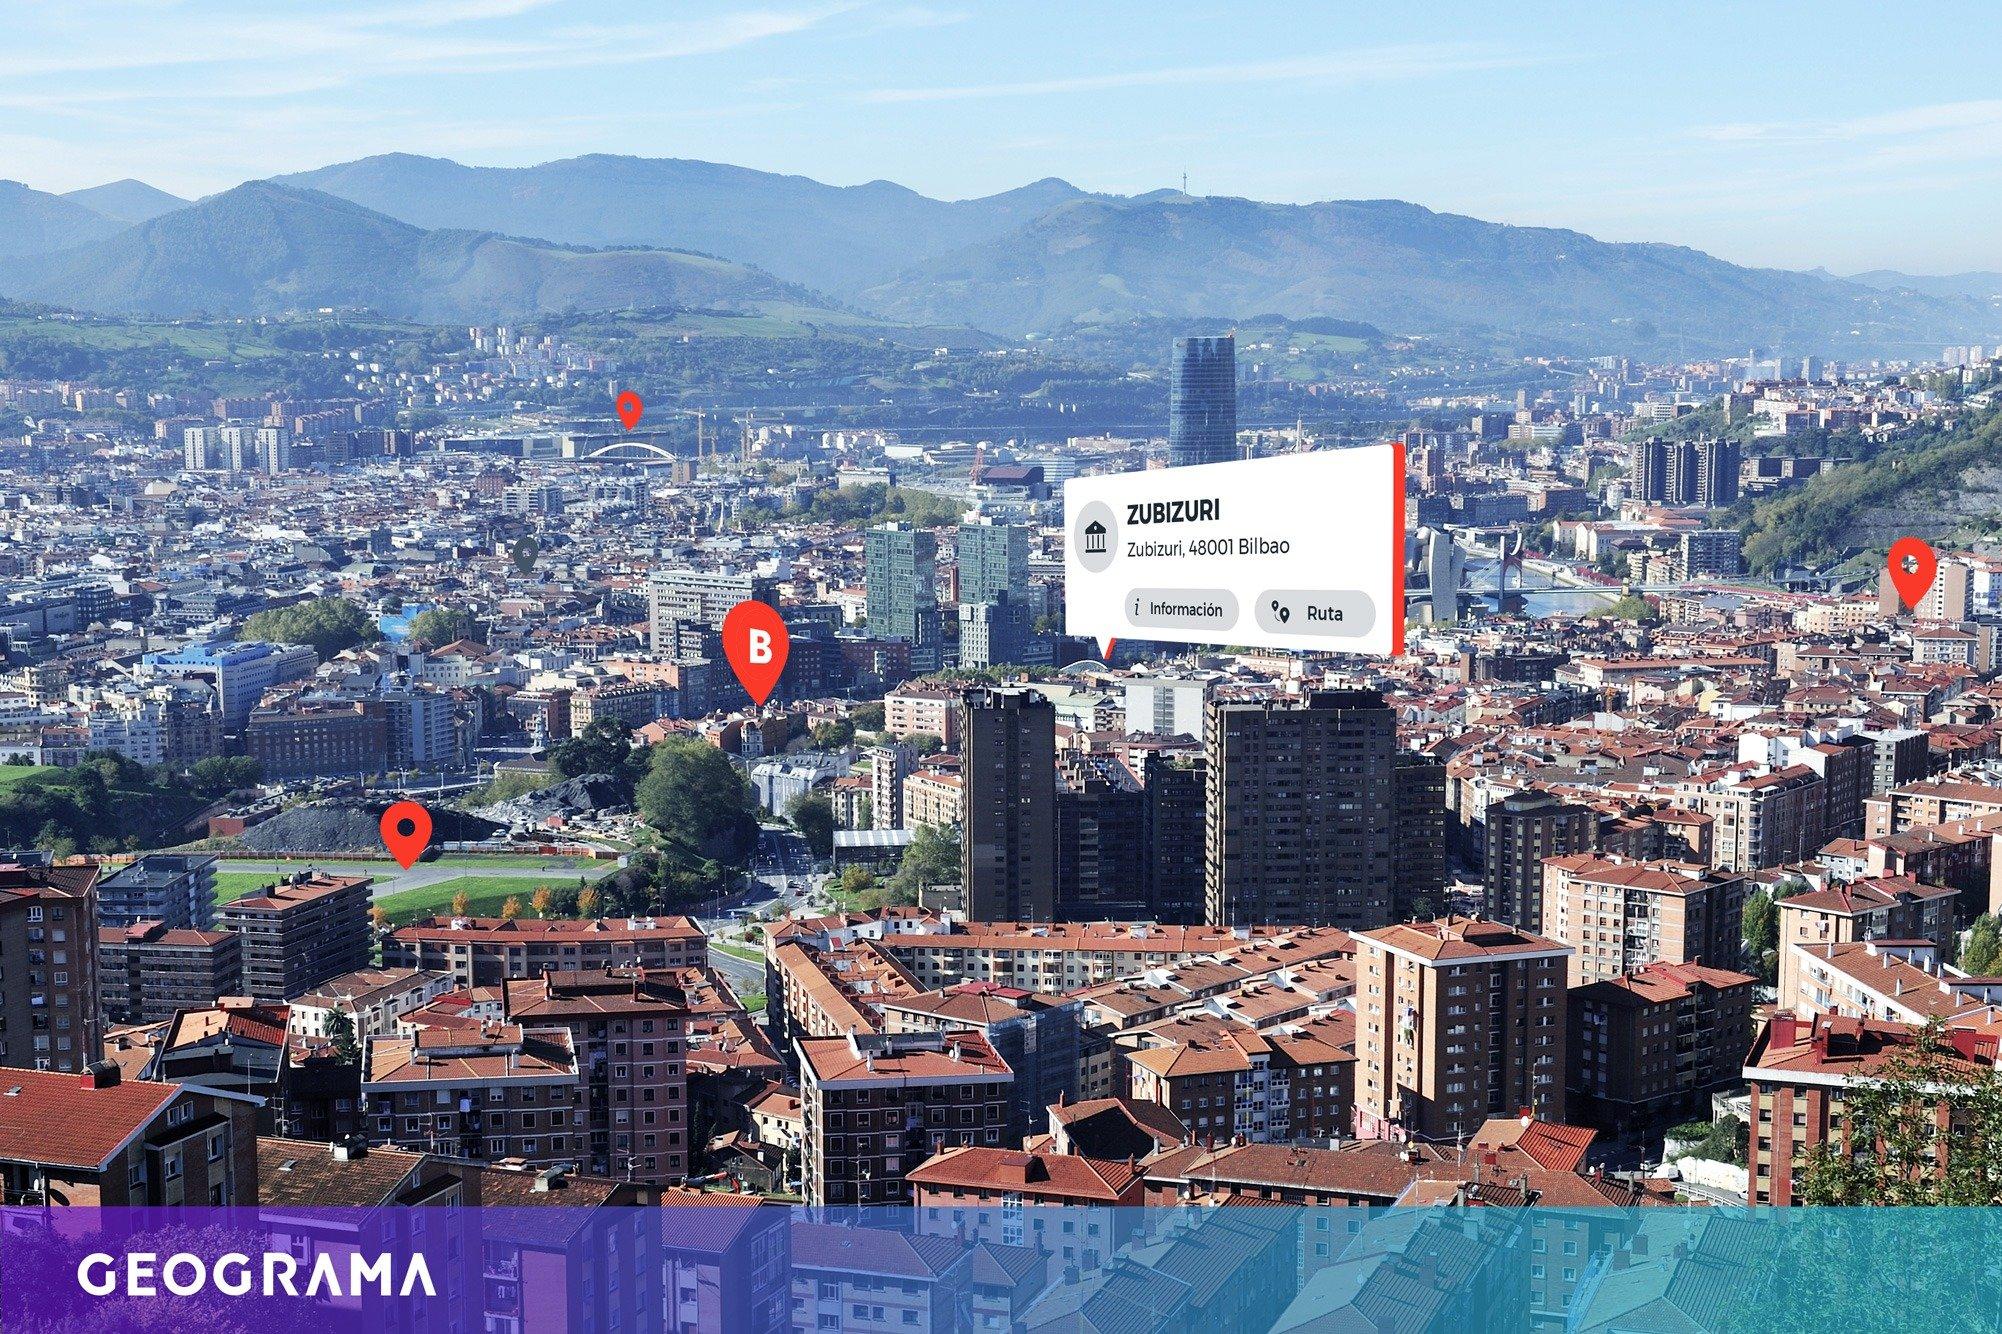 Bilbao_Geograma_Zubizuri